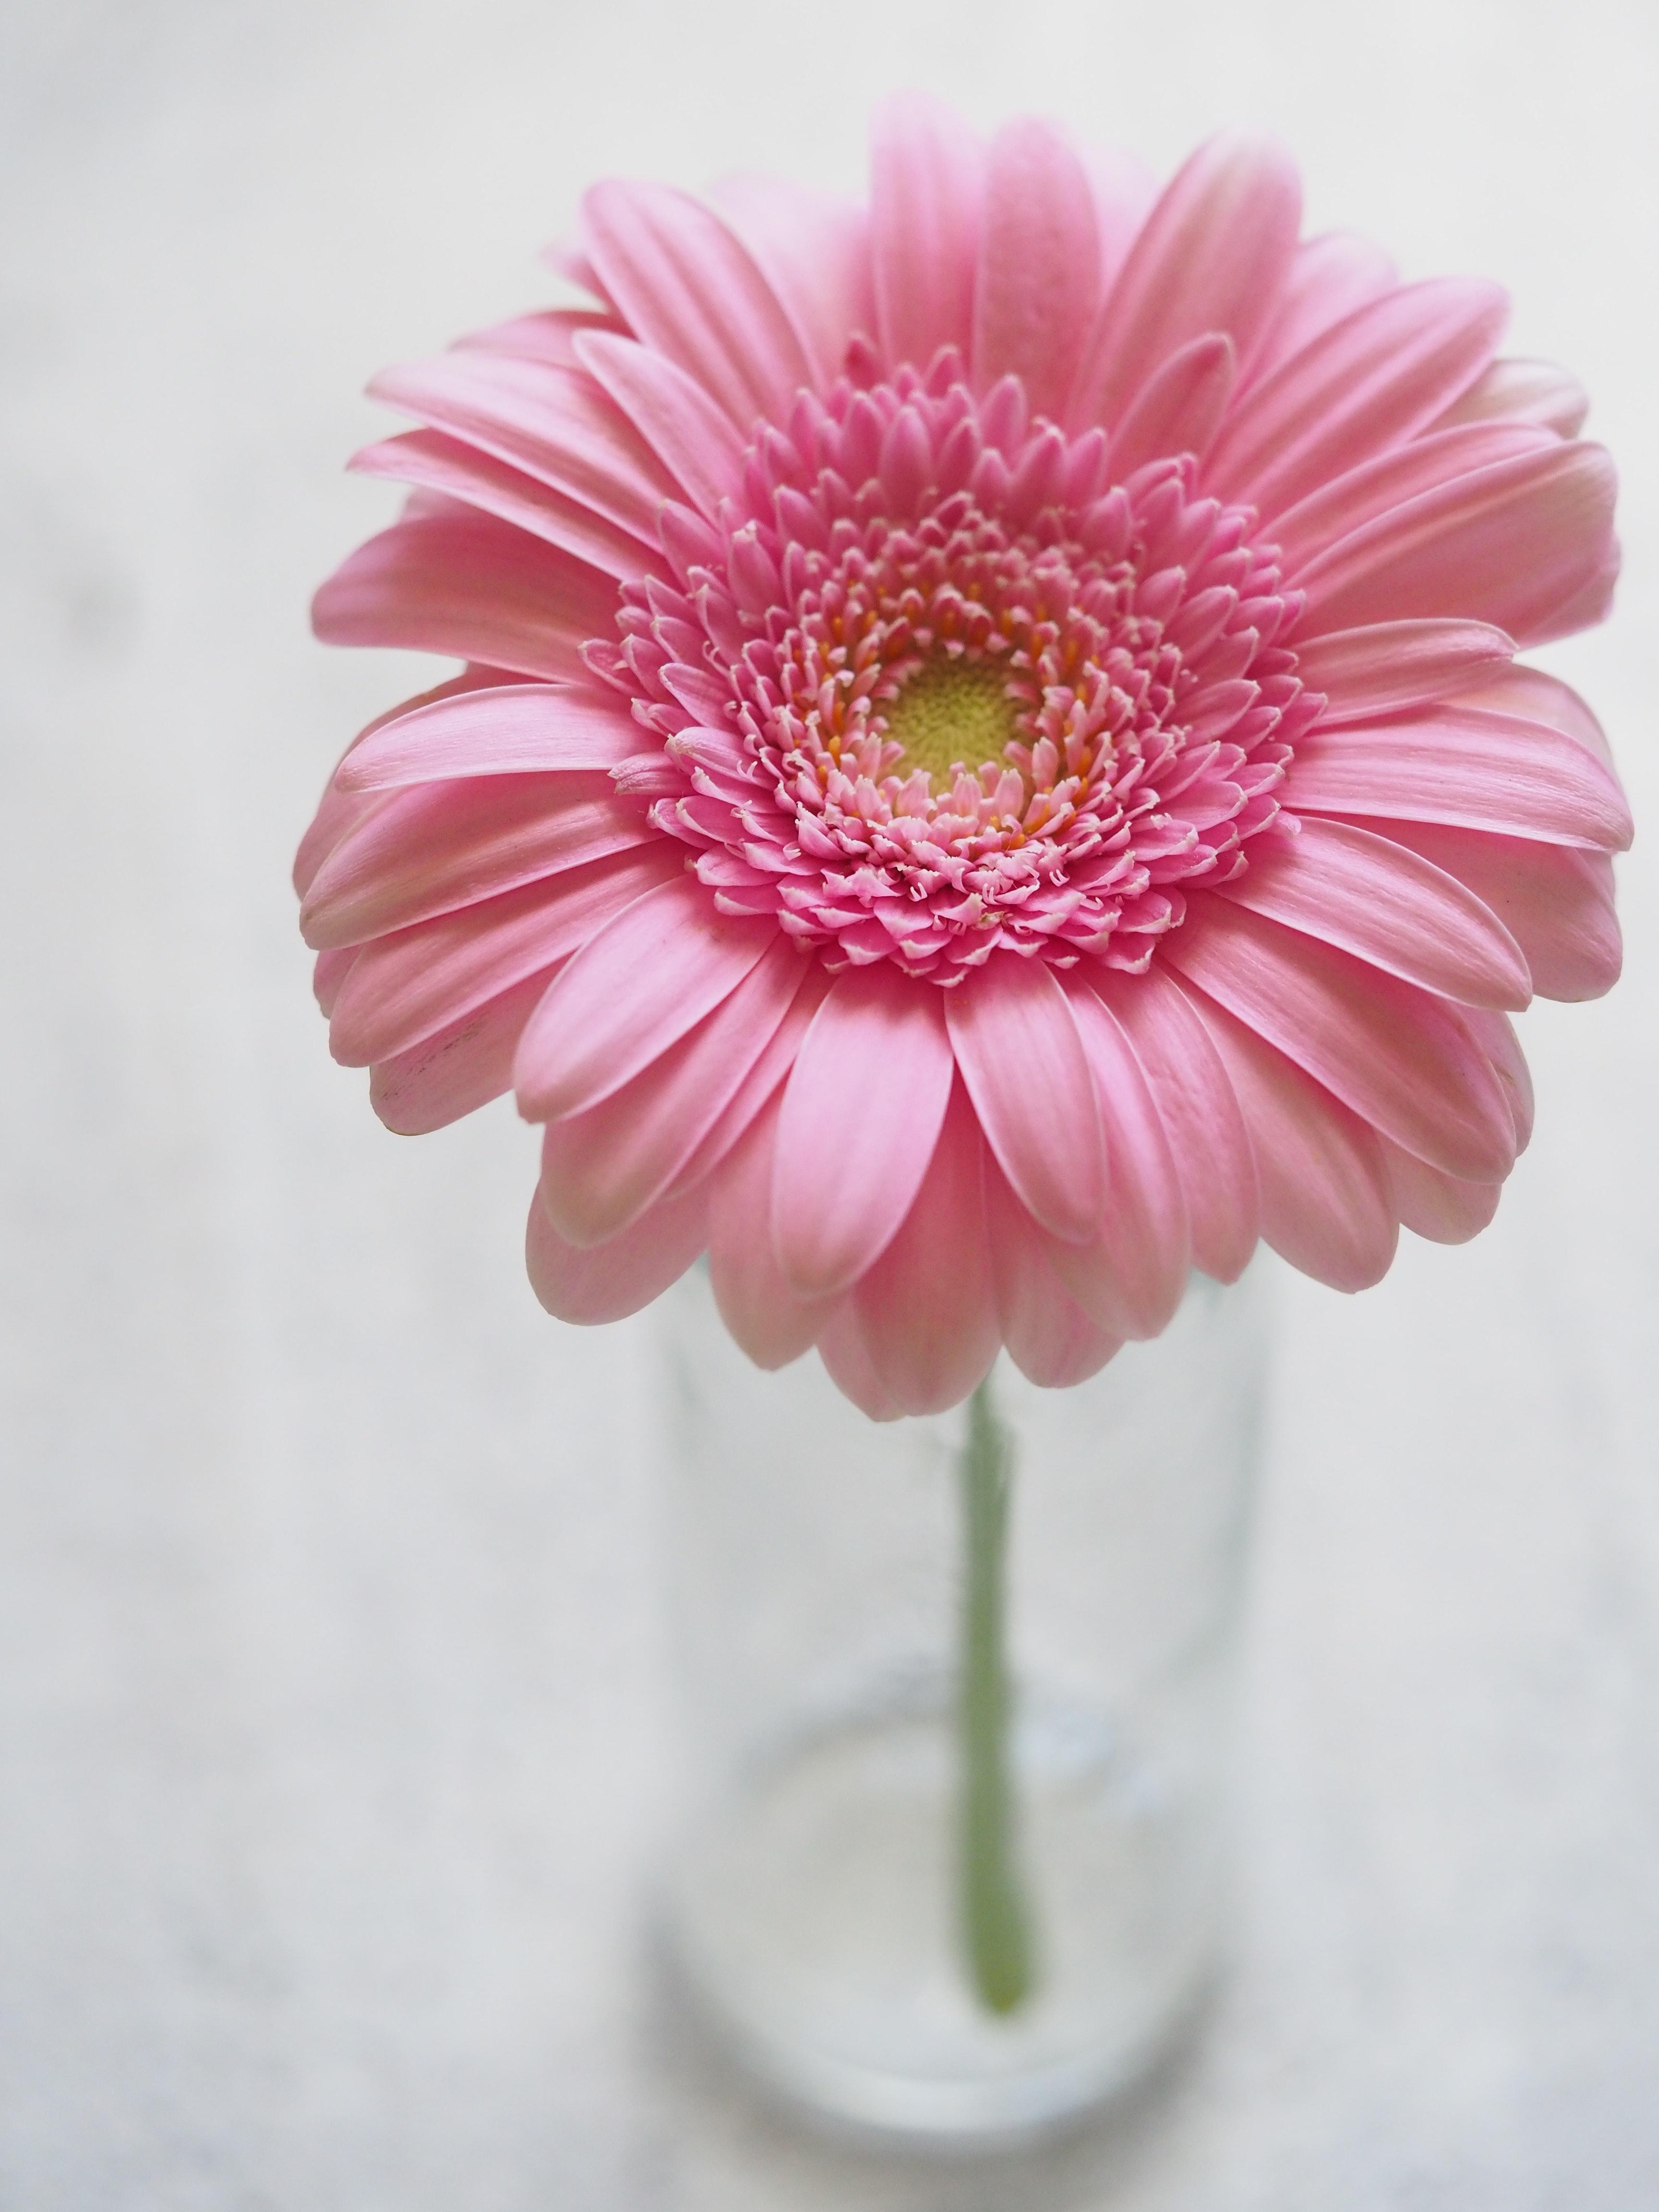 Pink Gerbera Flower In Closeup Photography Free Stock Photo